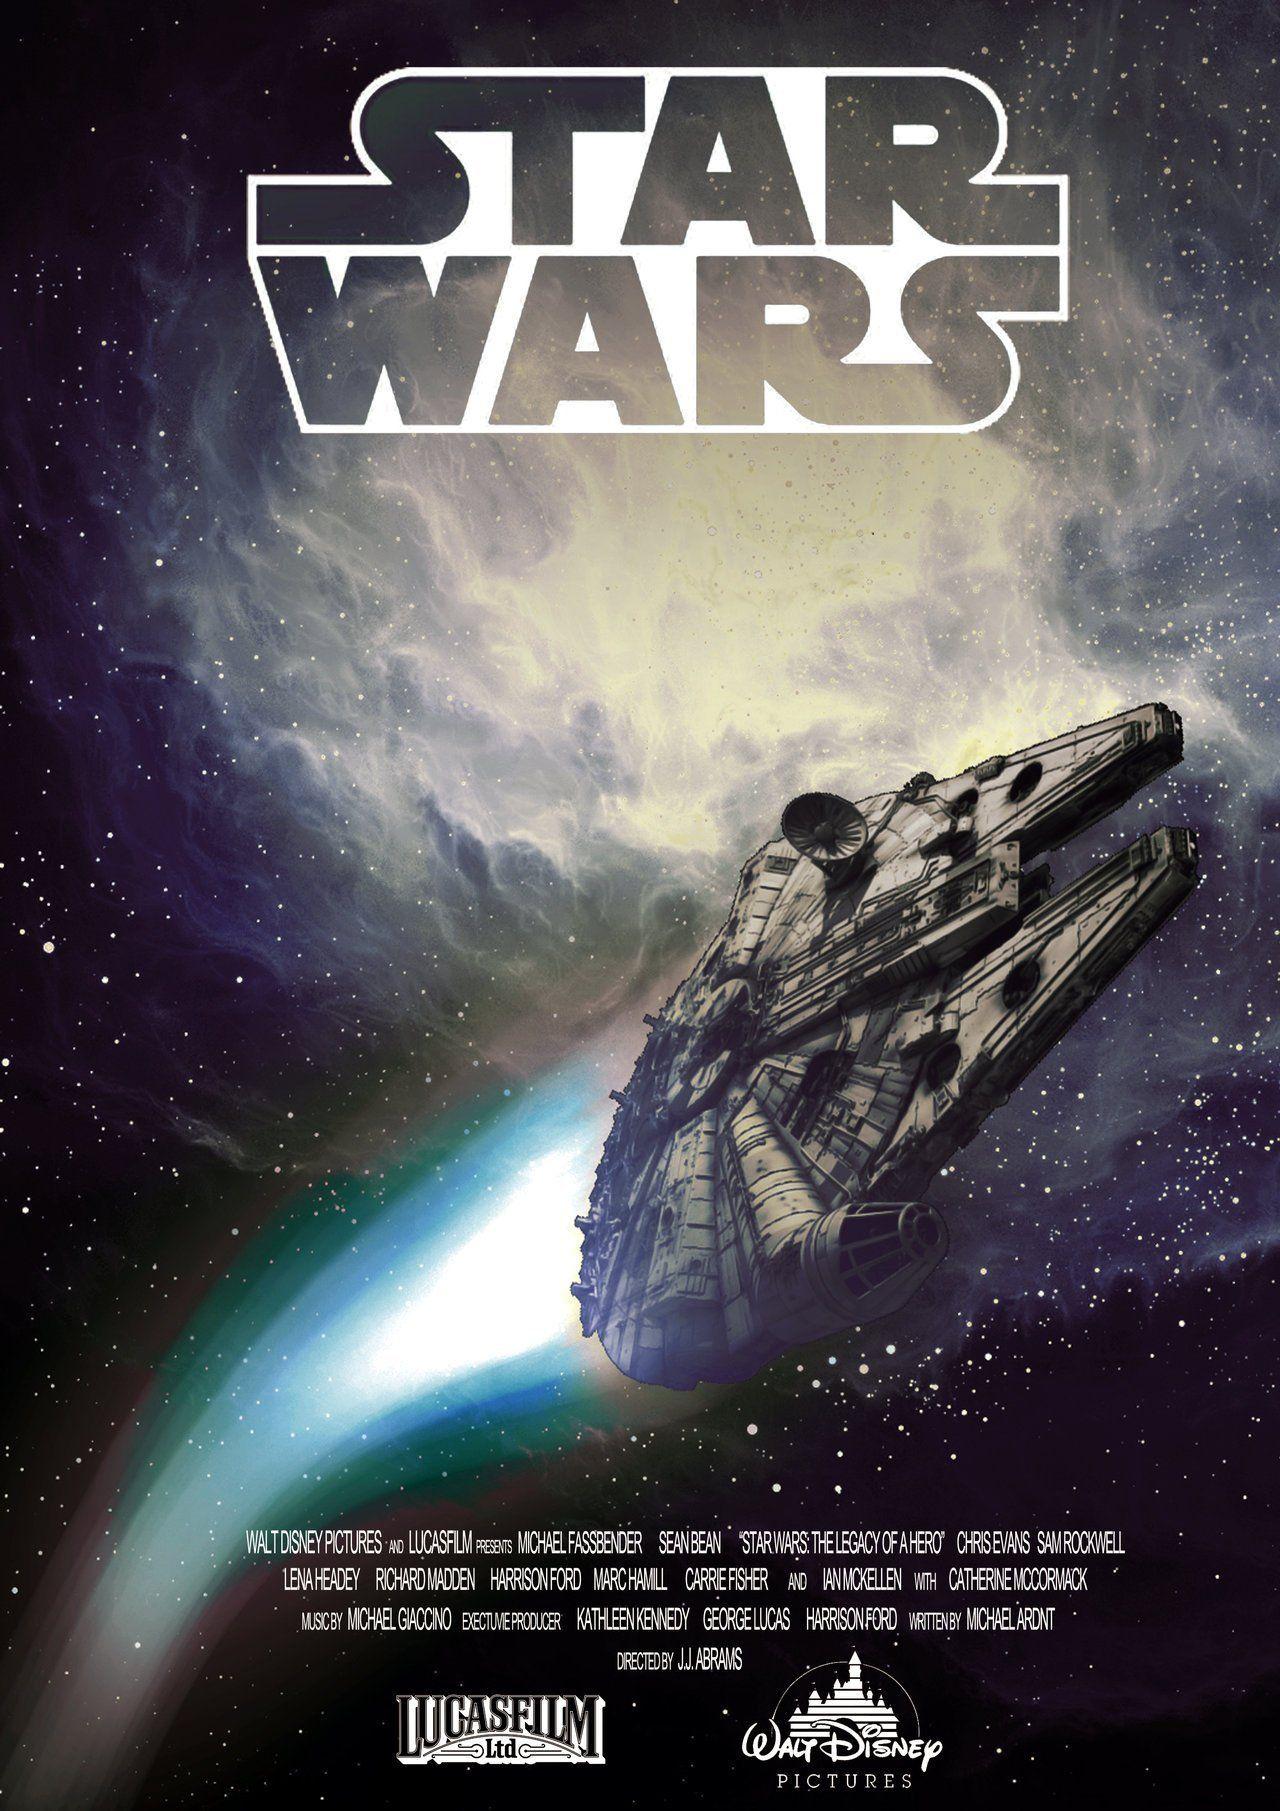 Star Wars Episode 7 Millenium Falcon Poster Fan Made